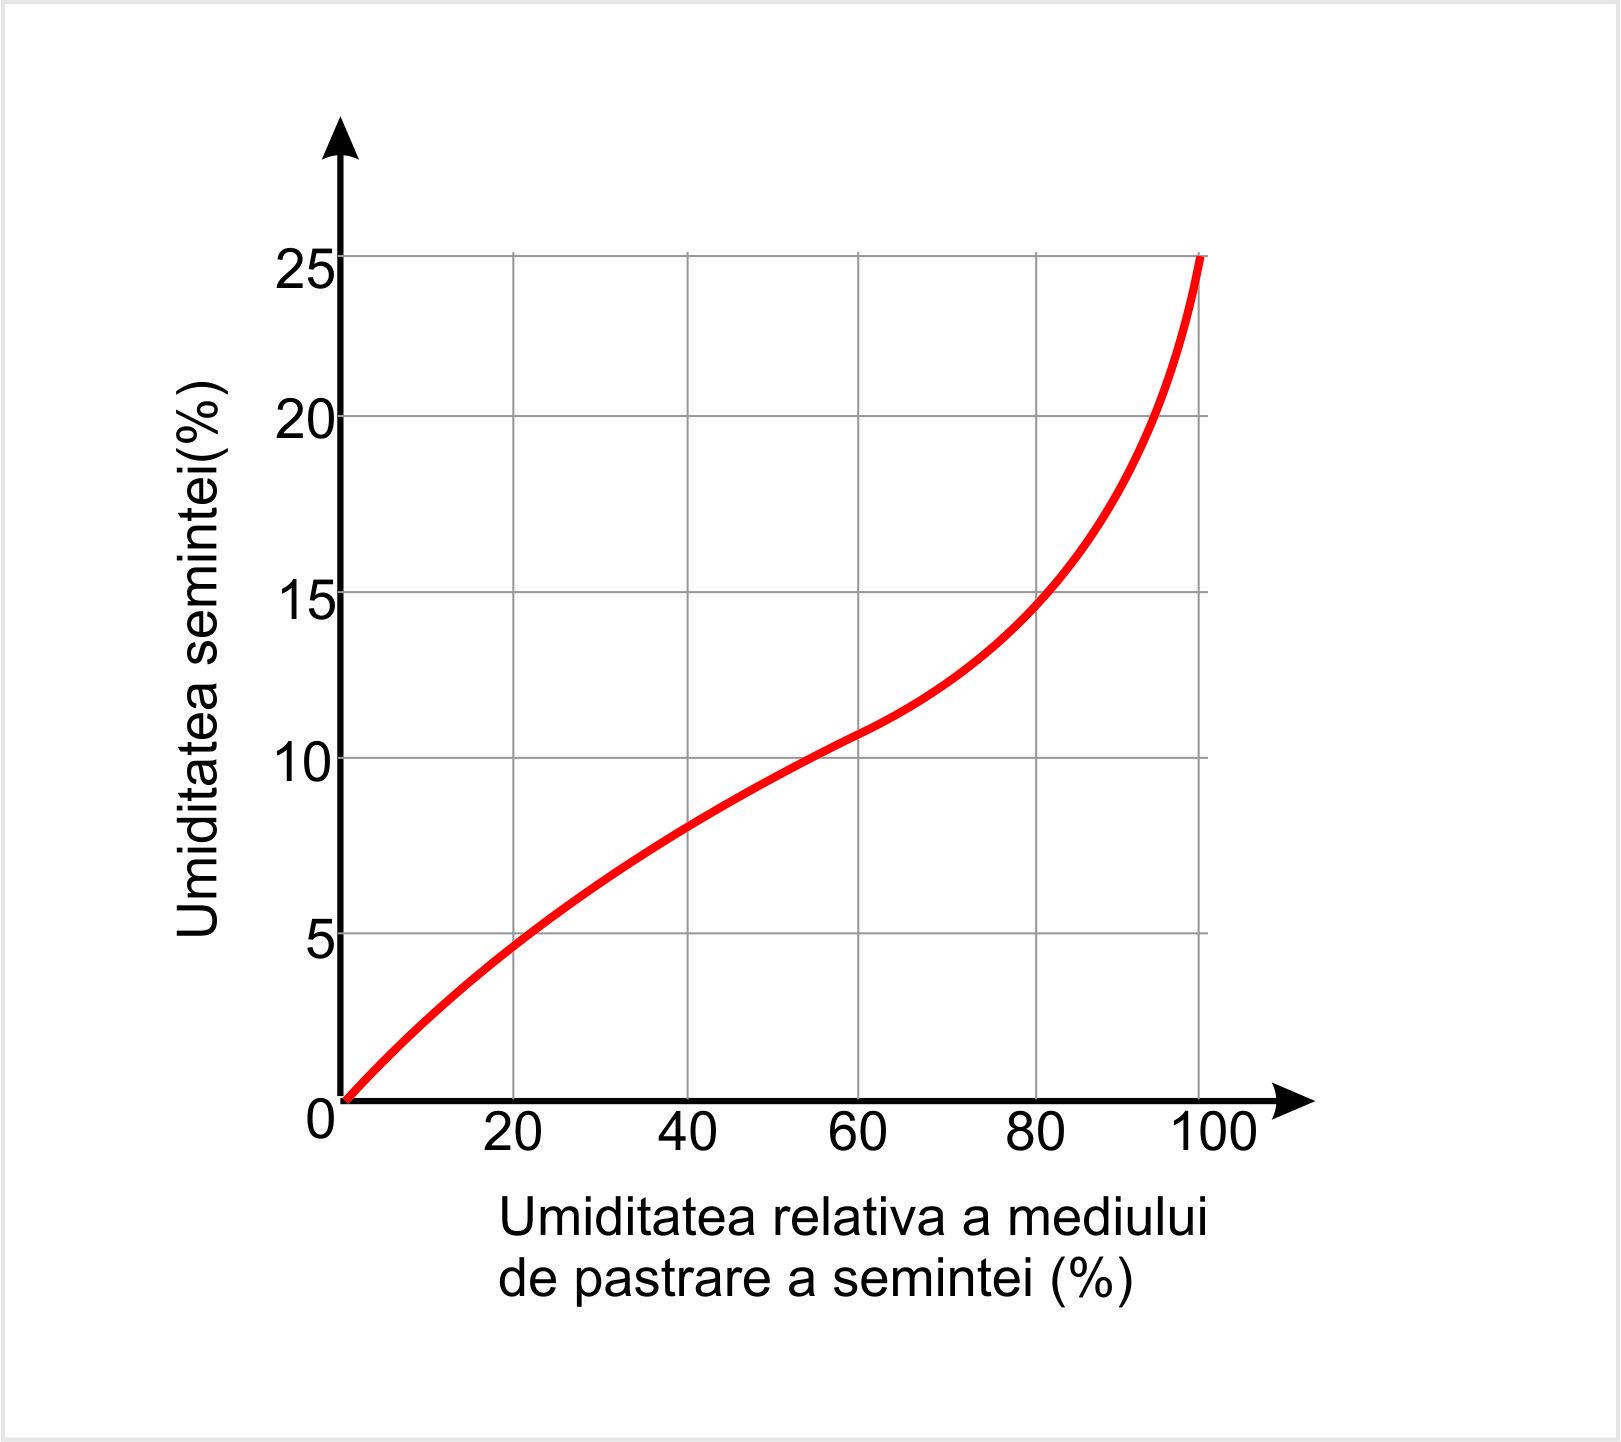 Umiditatea semintelor in functie de mediul de pastrare